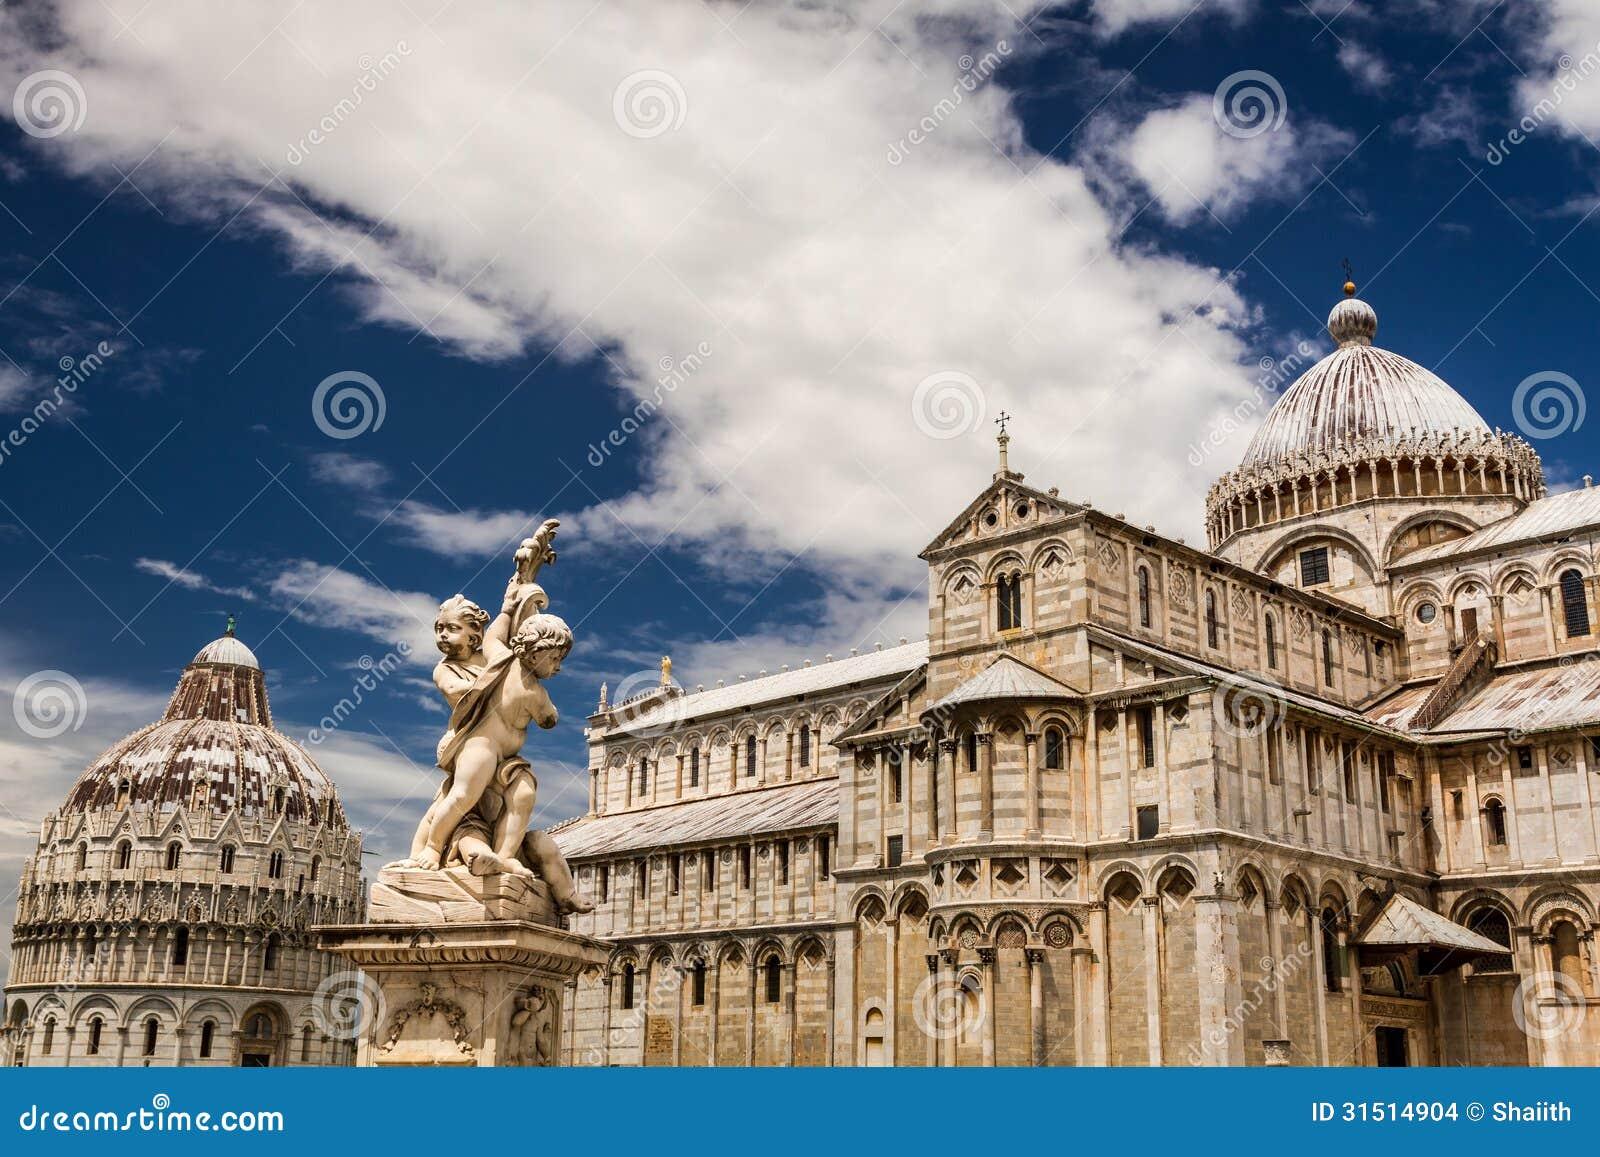 Beautiful ancient monuments in Pisa